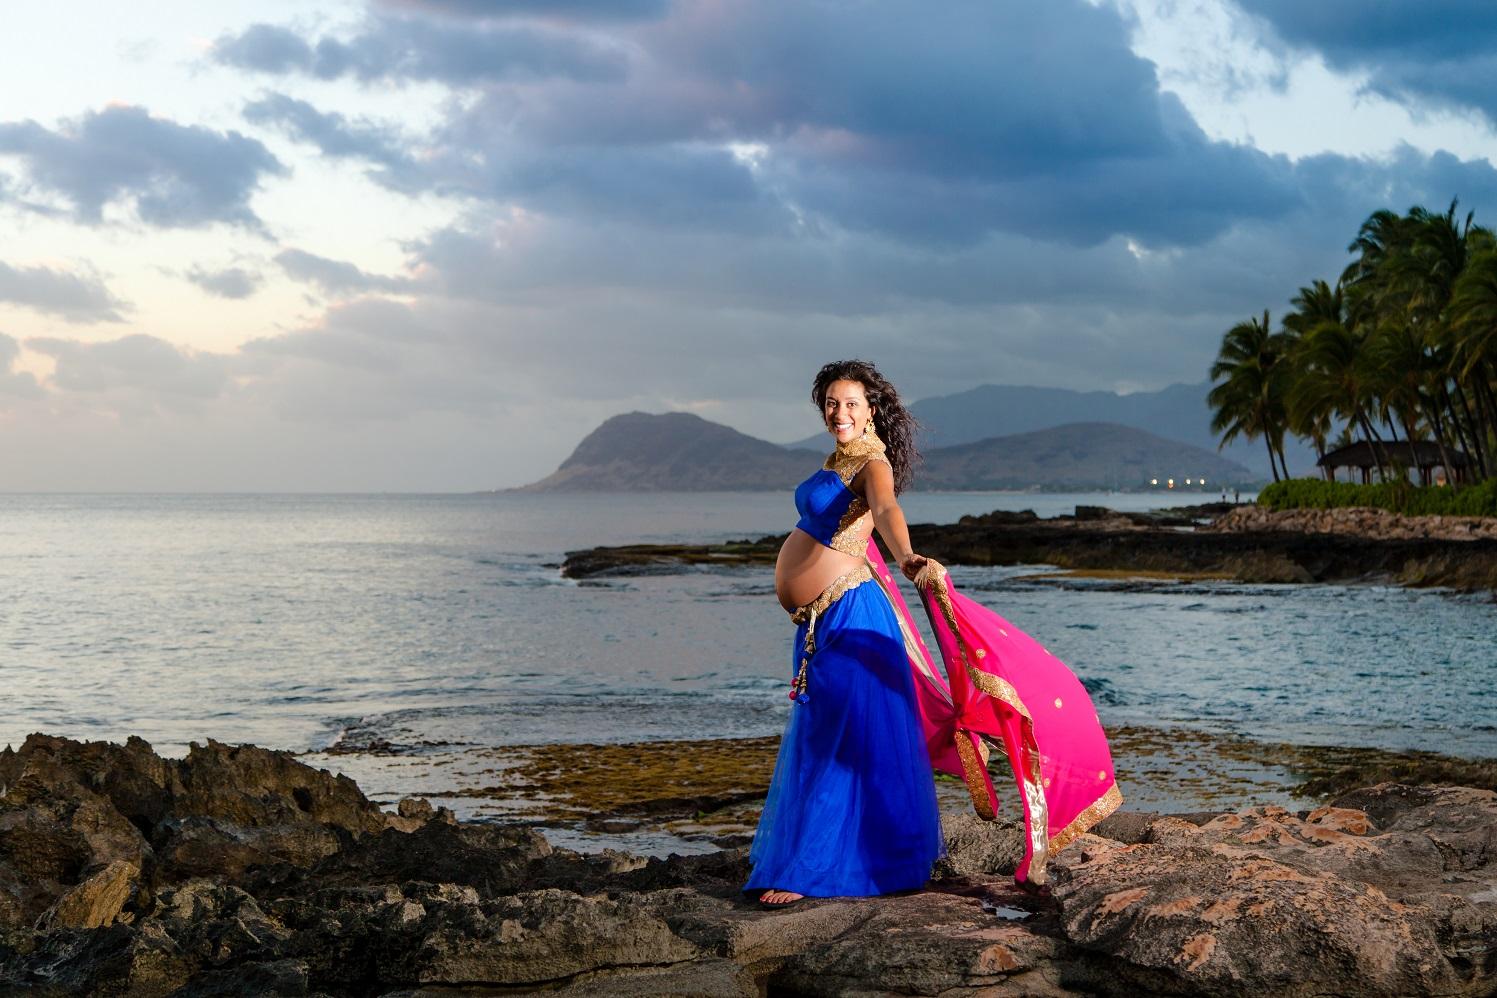 sunset indian maternity photo session beach oahu